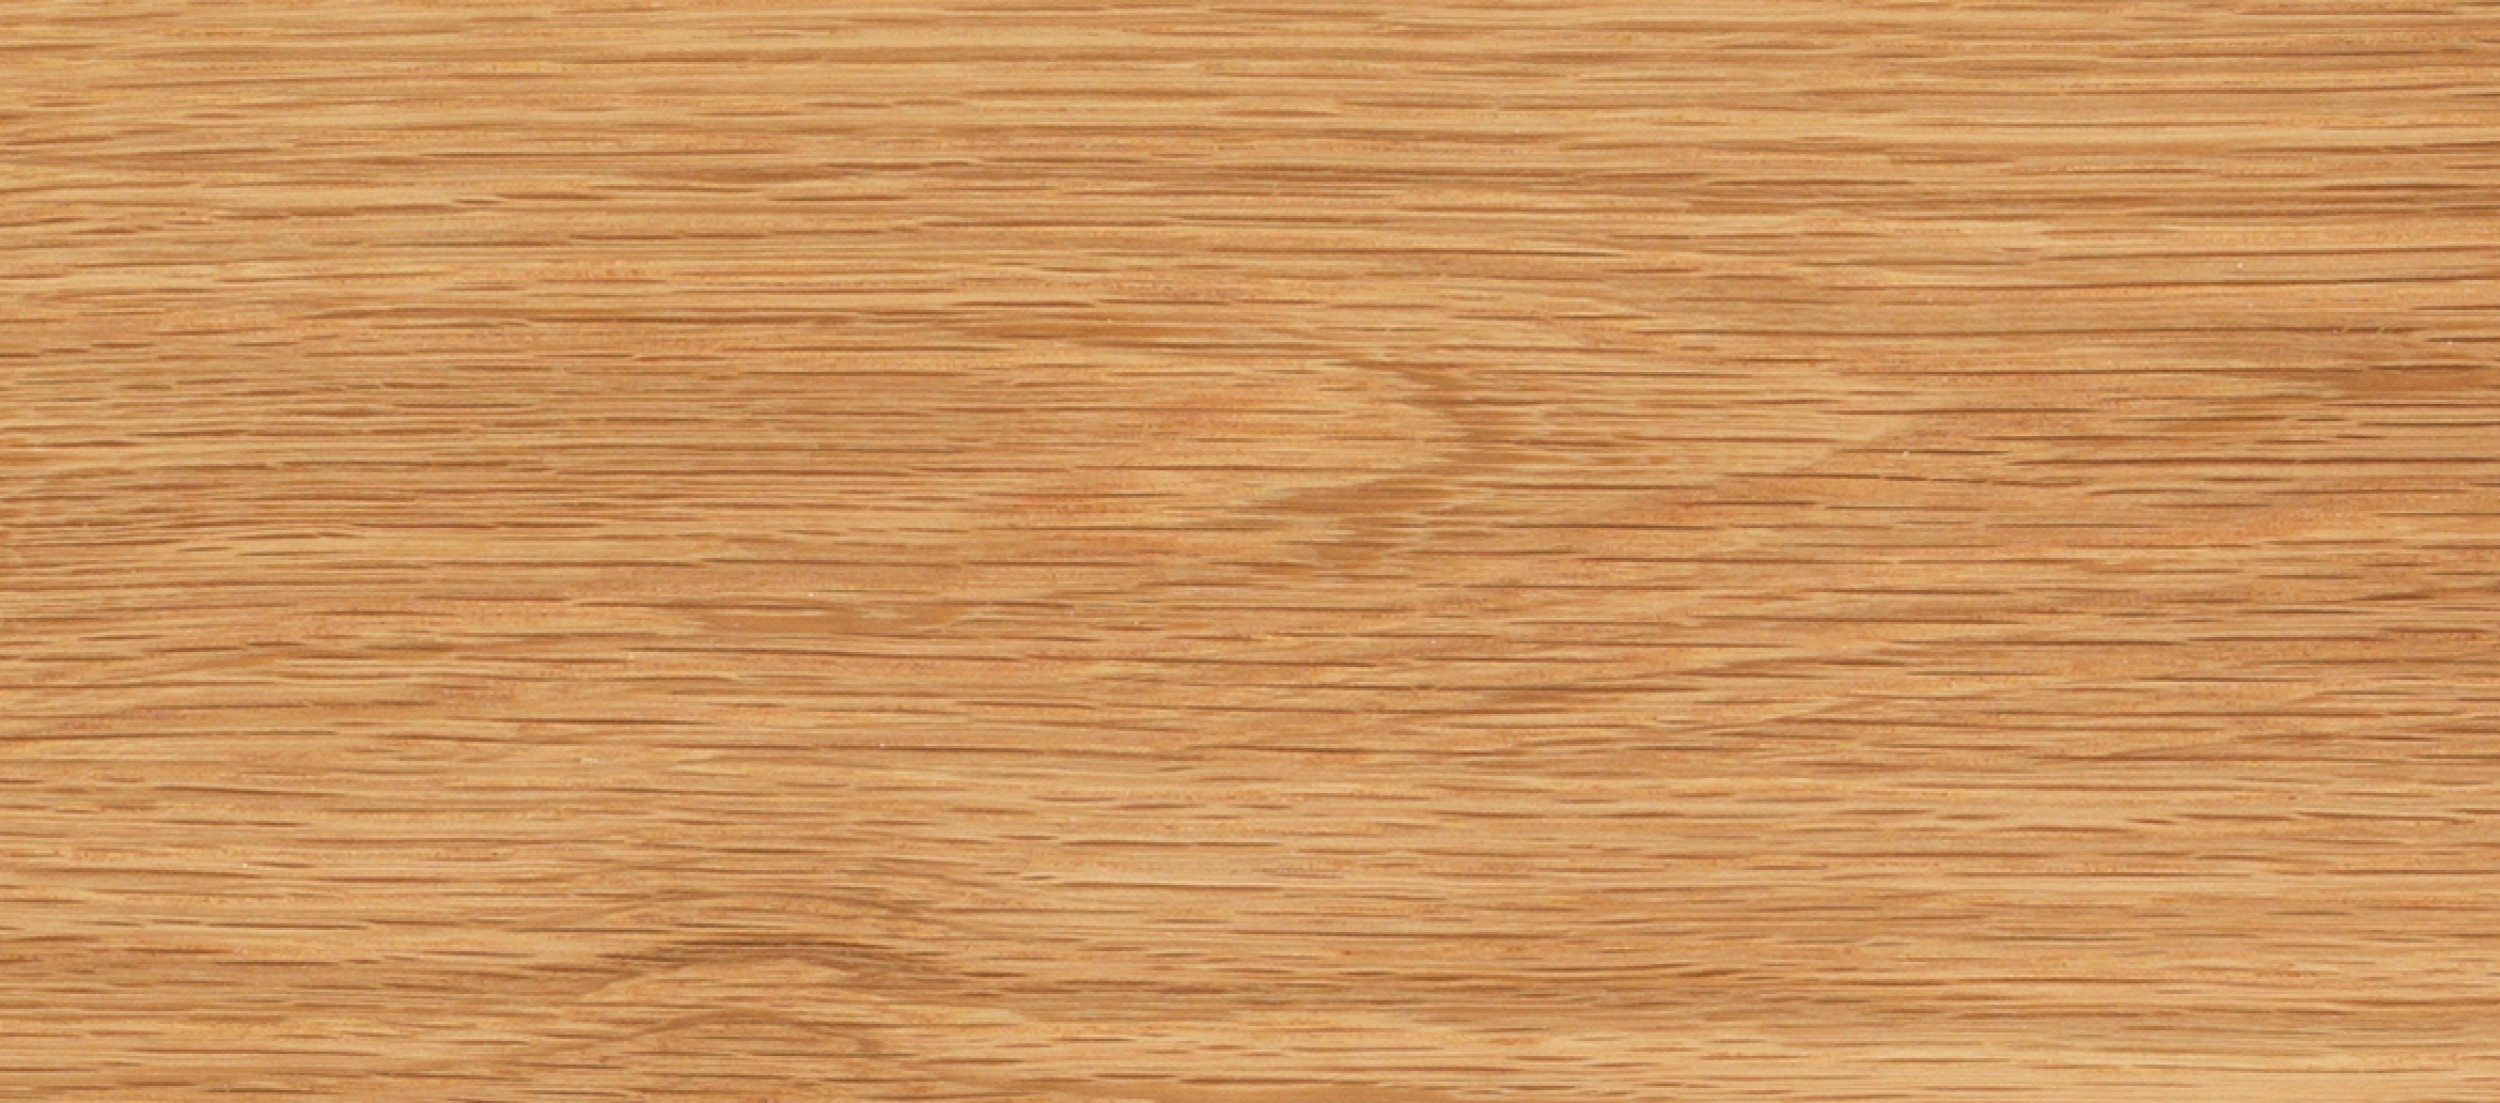 Cube Oak 3 Drawer Bedside Cabinet Quercus Living